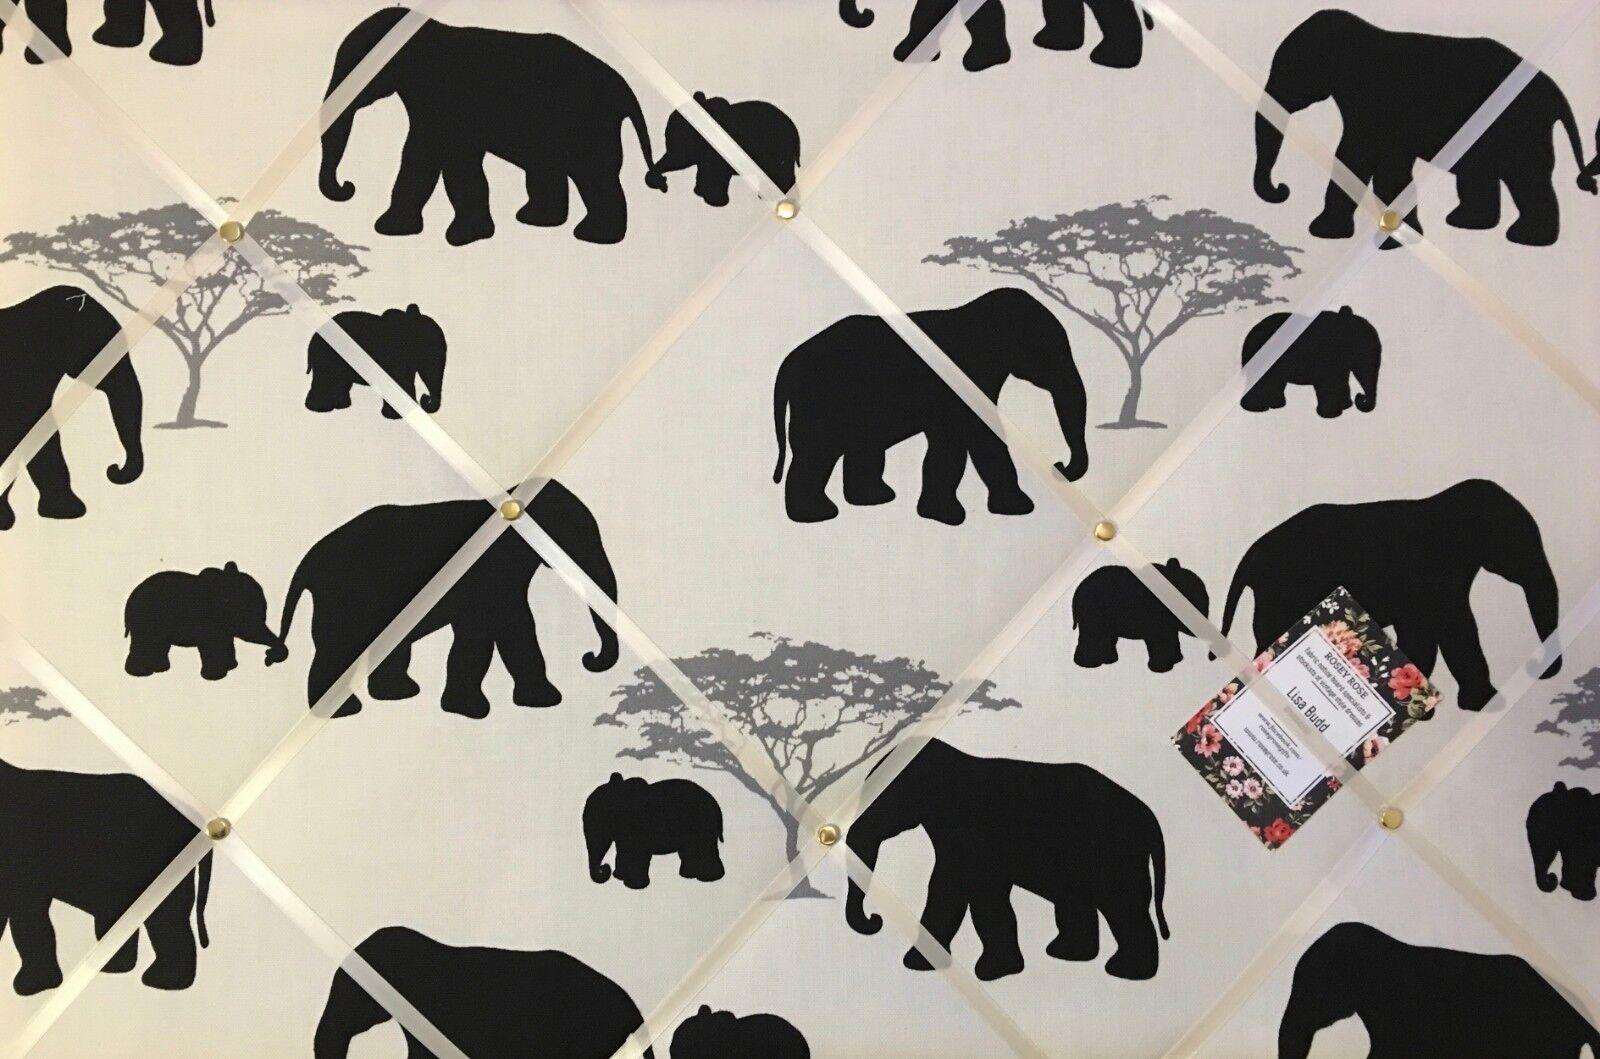 Marson Elephants Handcrafted Fabric Notice Pin Memo Memory Photo Board